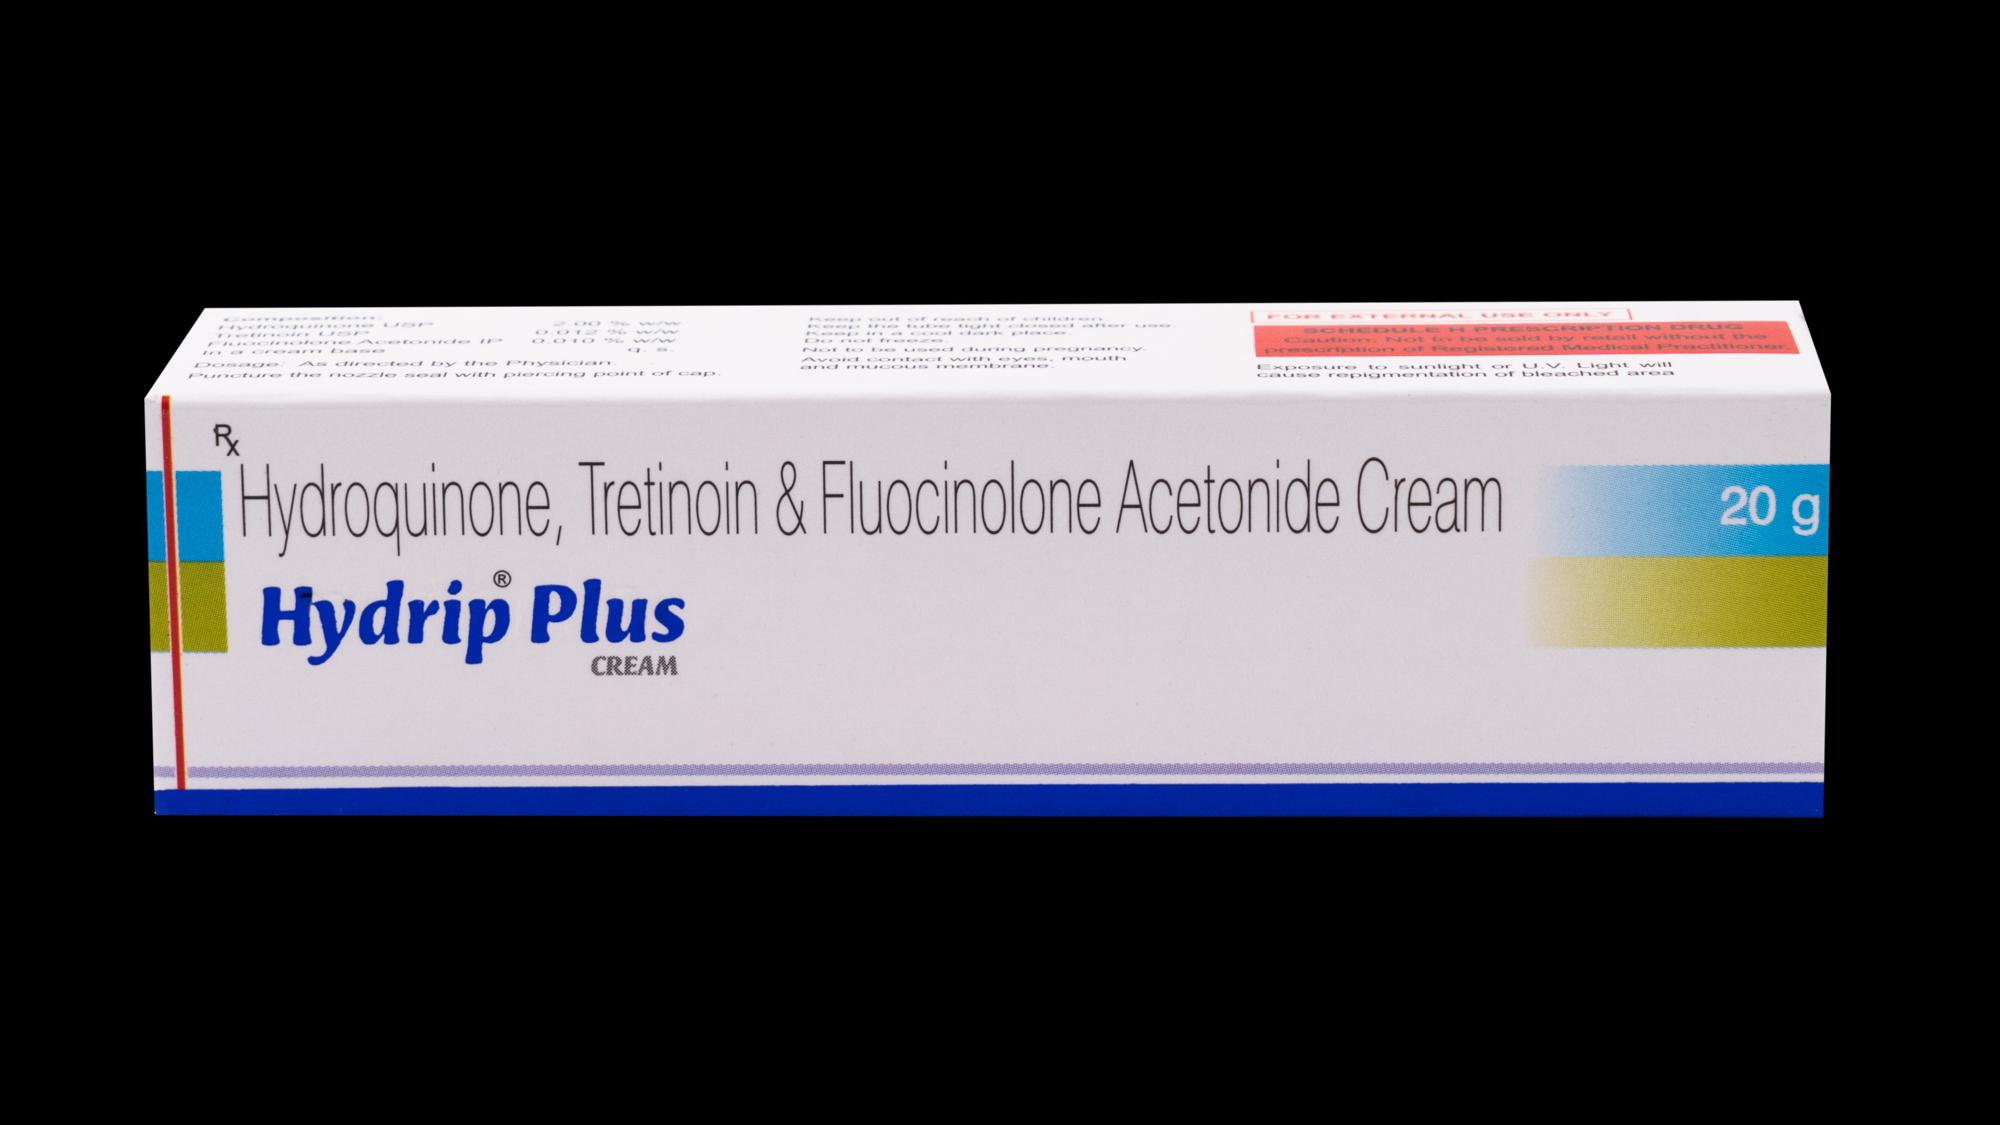 Hydroquinone, Tretinoin & Fluocinolone Acetonide Cream